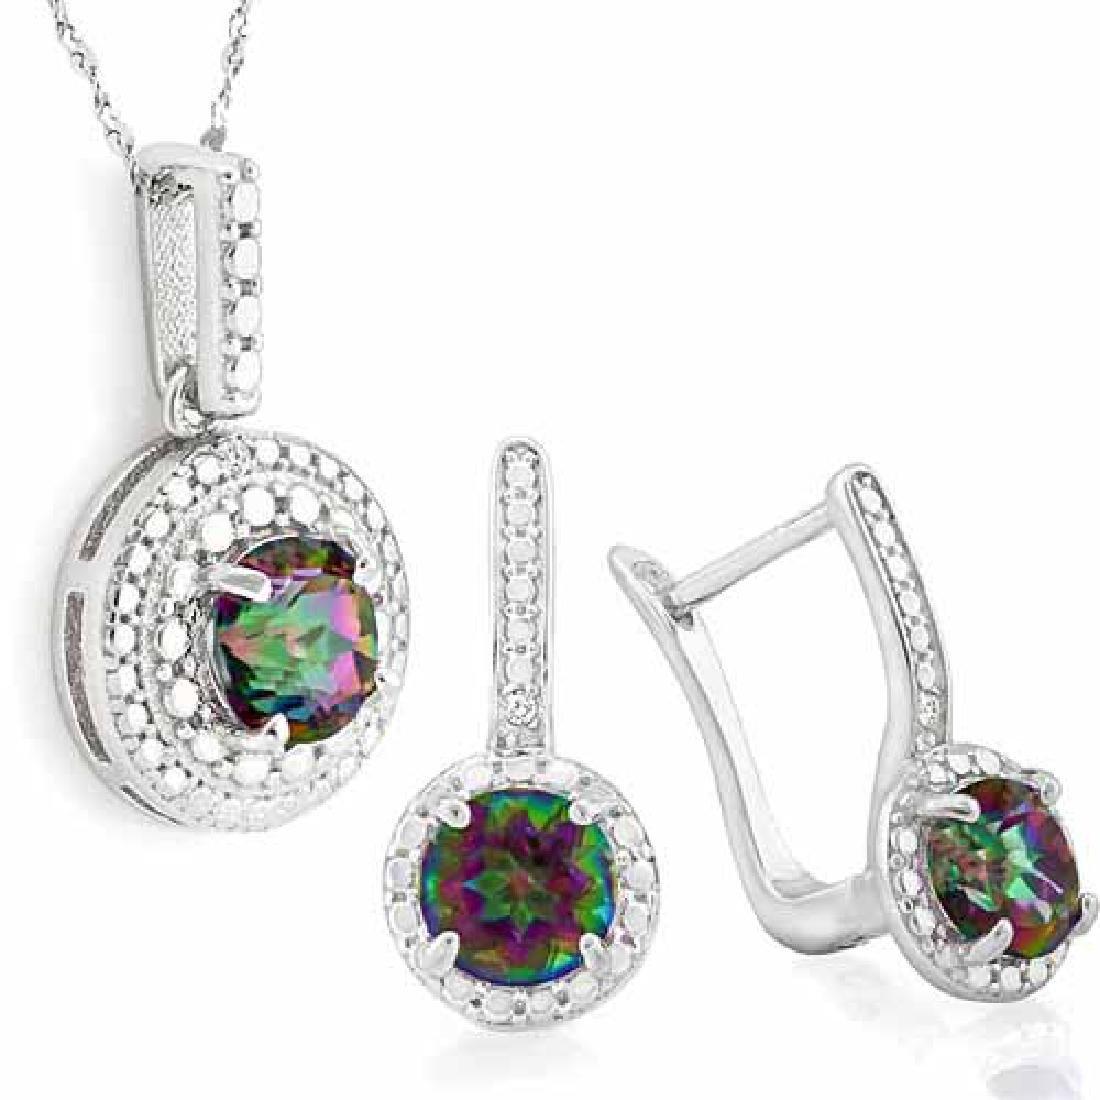 3 CARAT MYSTIC GEMSTONE & DIAMOND 925 STERLING SILVER S